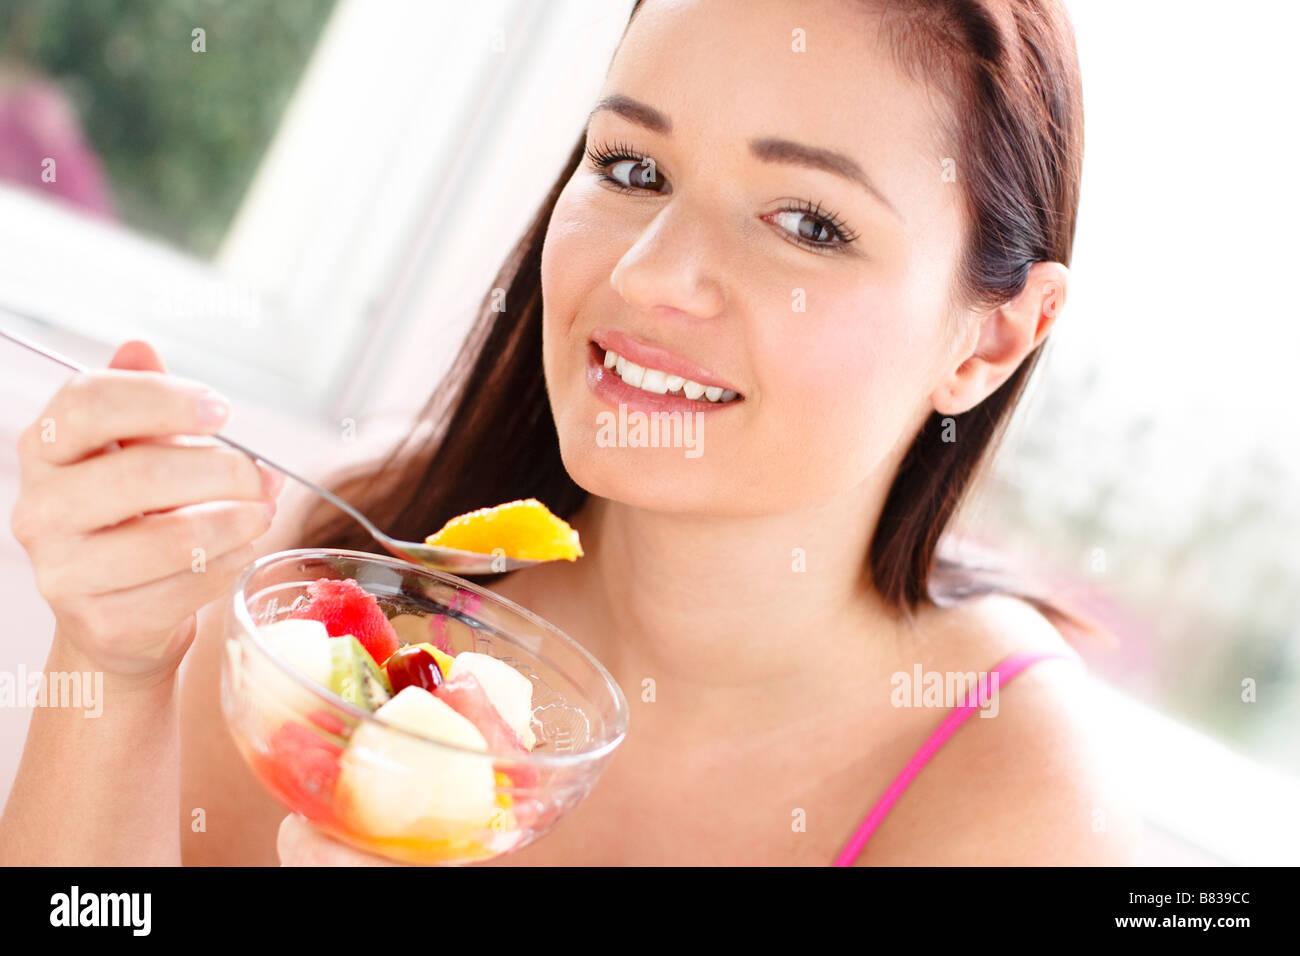 Girl eating fruit - Stock Image